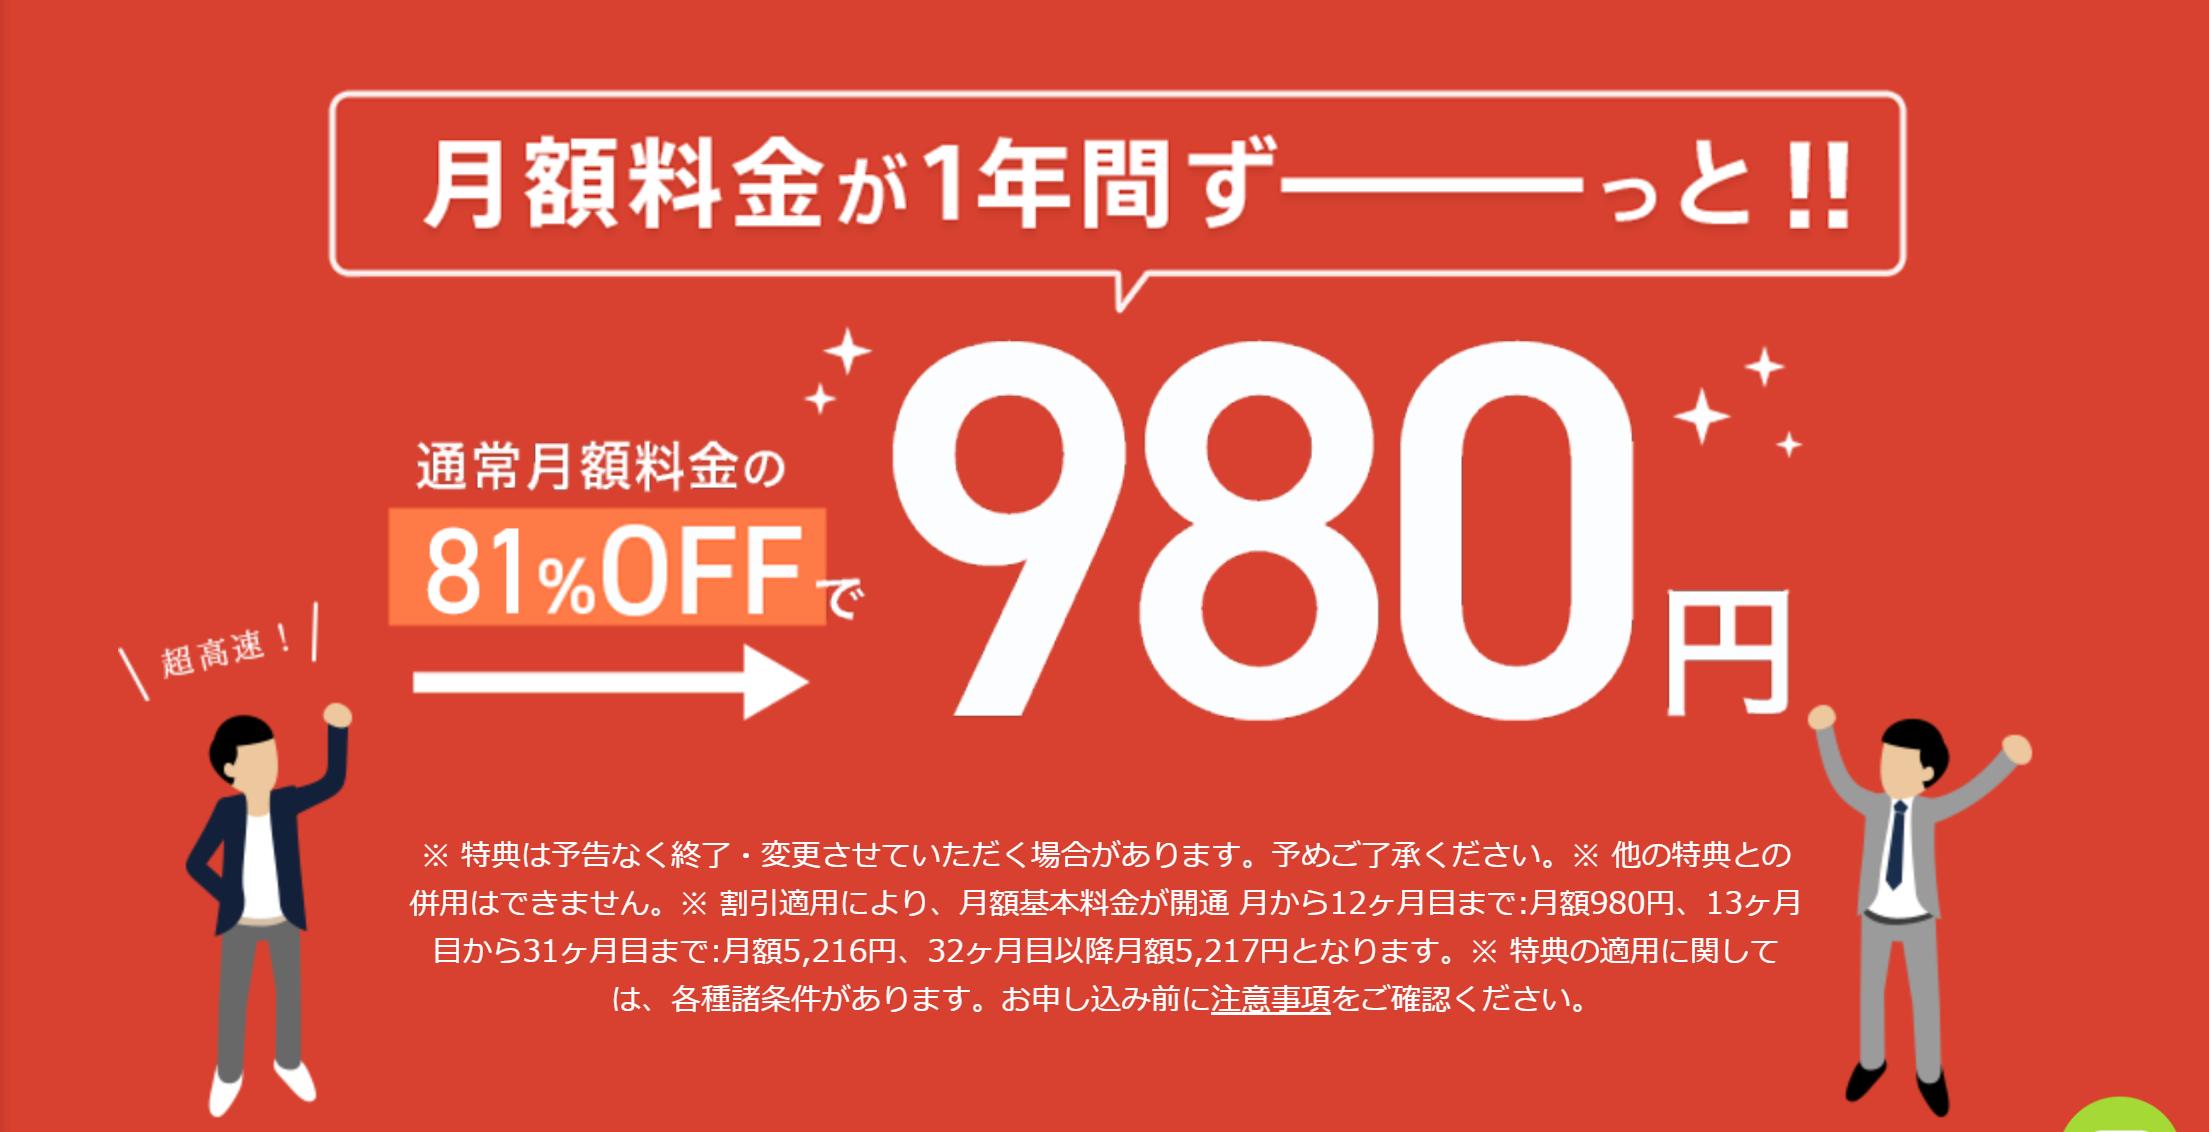 NURO光 キャンペーン 980円